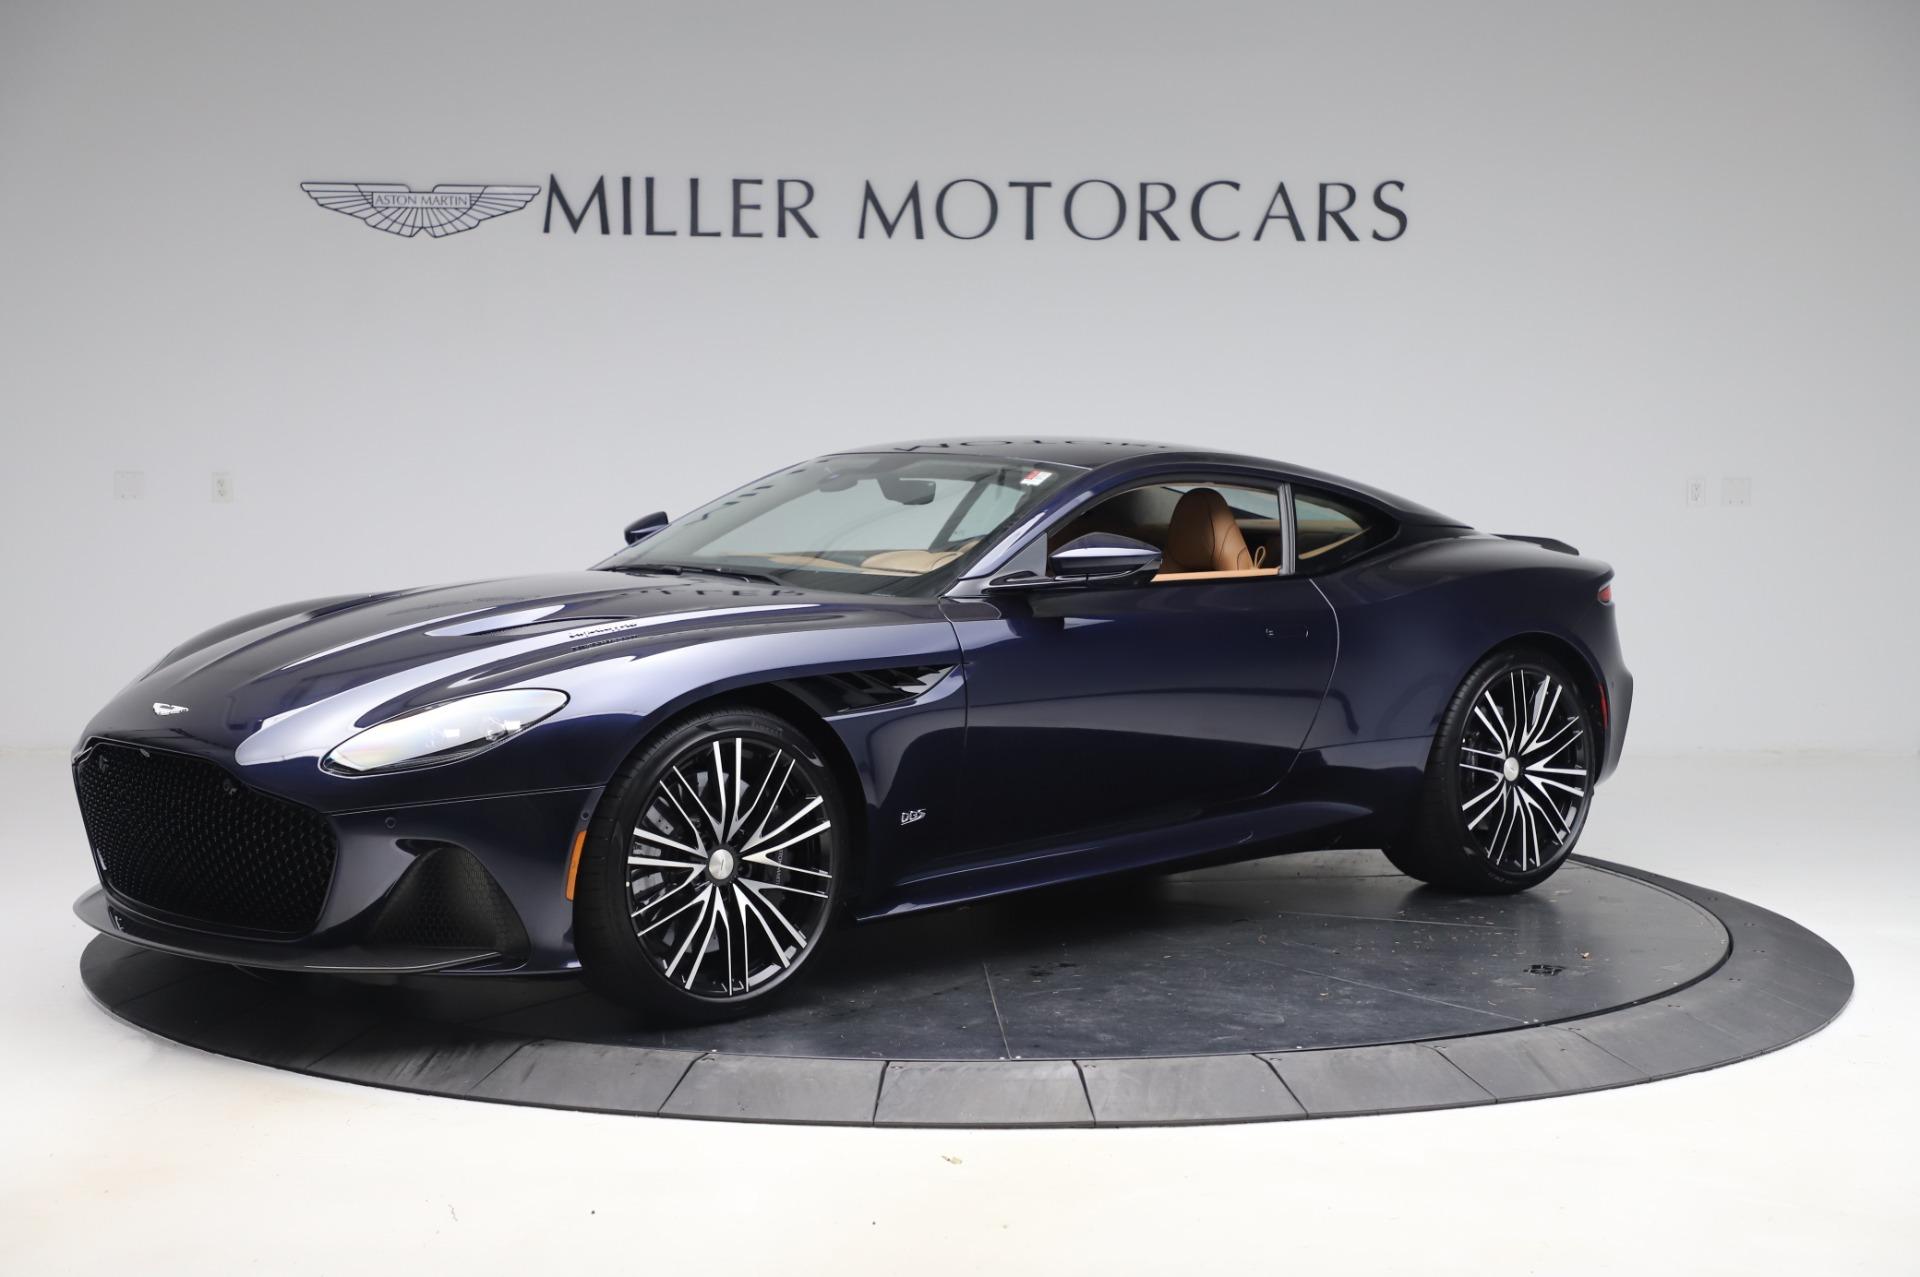 New 2020 Aston Martin DBS Superleggera Coupe for sale $338,286 at Alfa Romeo of Greenwich in Greenwich CT 06830 1